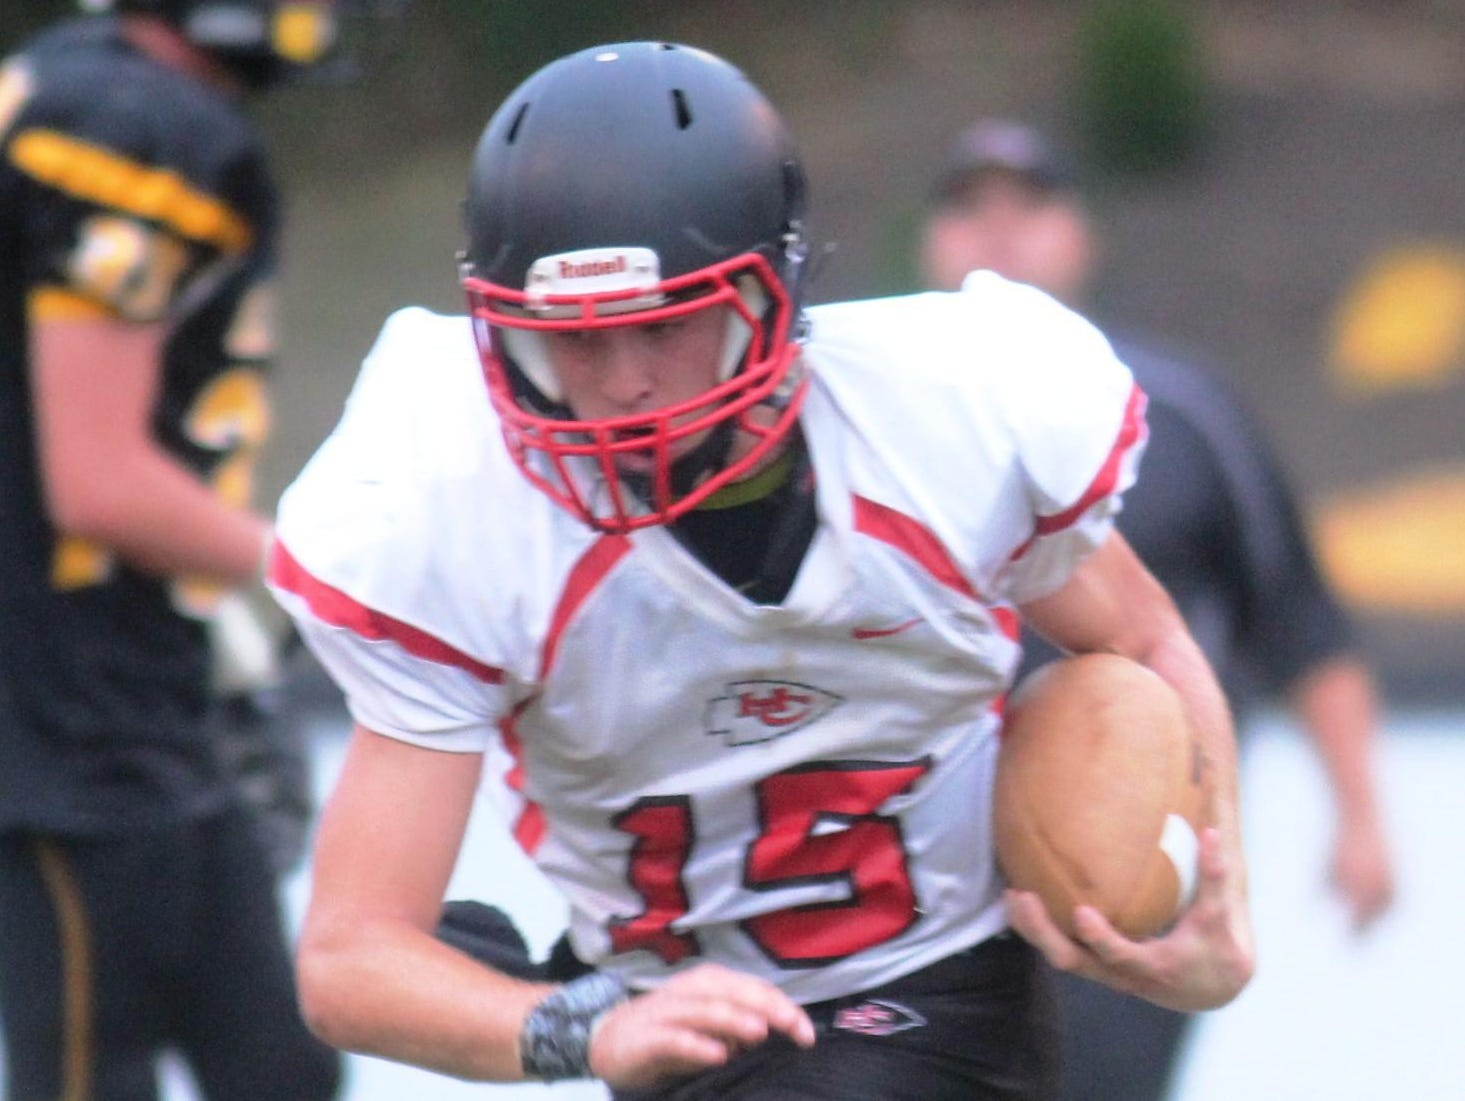 Holy Cross quarterback Hamilton Scott is entering his third year as a starter.